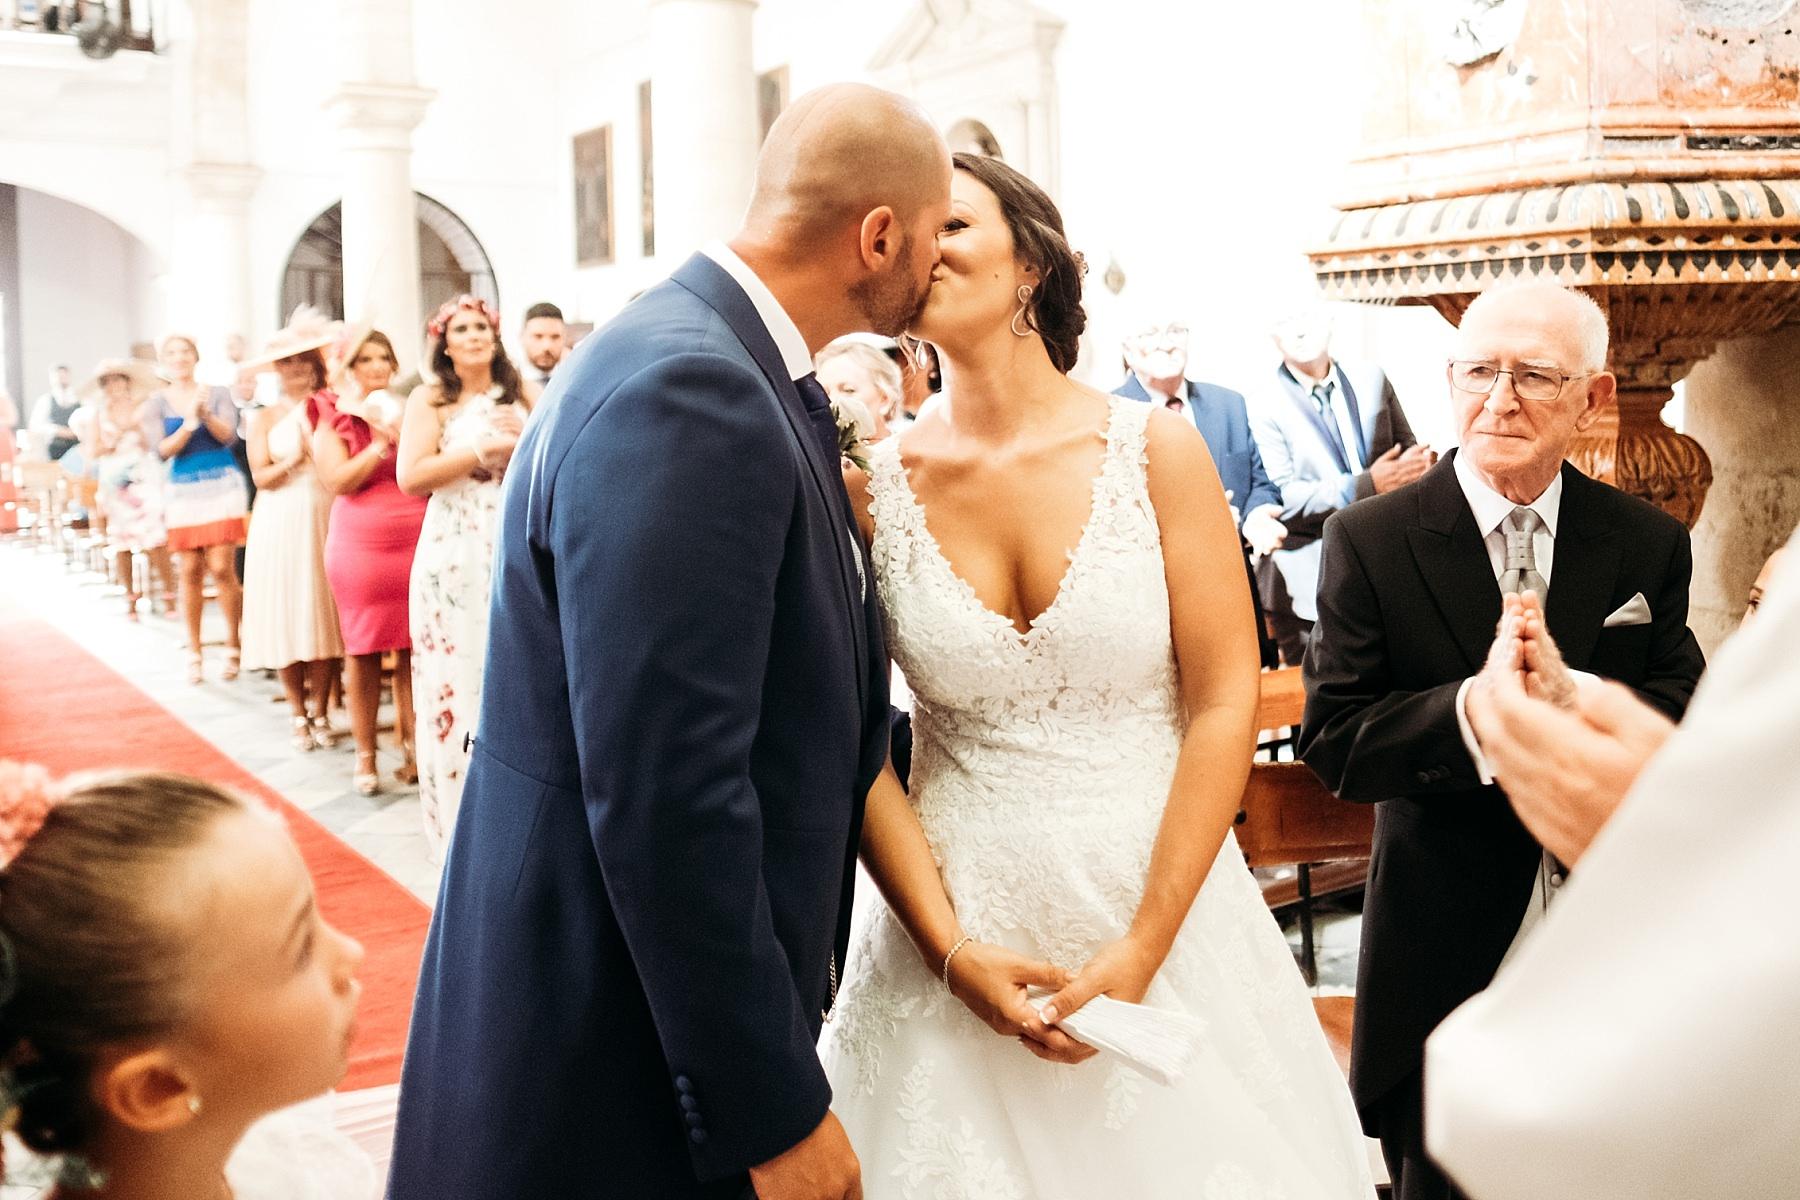 Boda en Puerto Real, Fotografo de boda